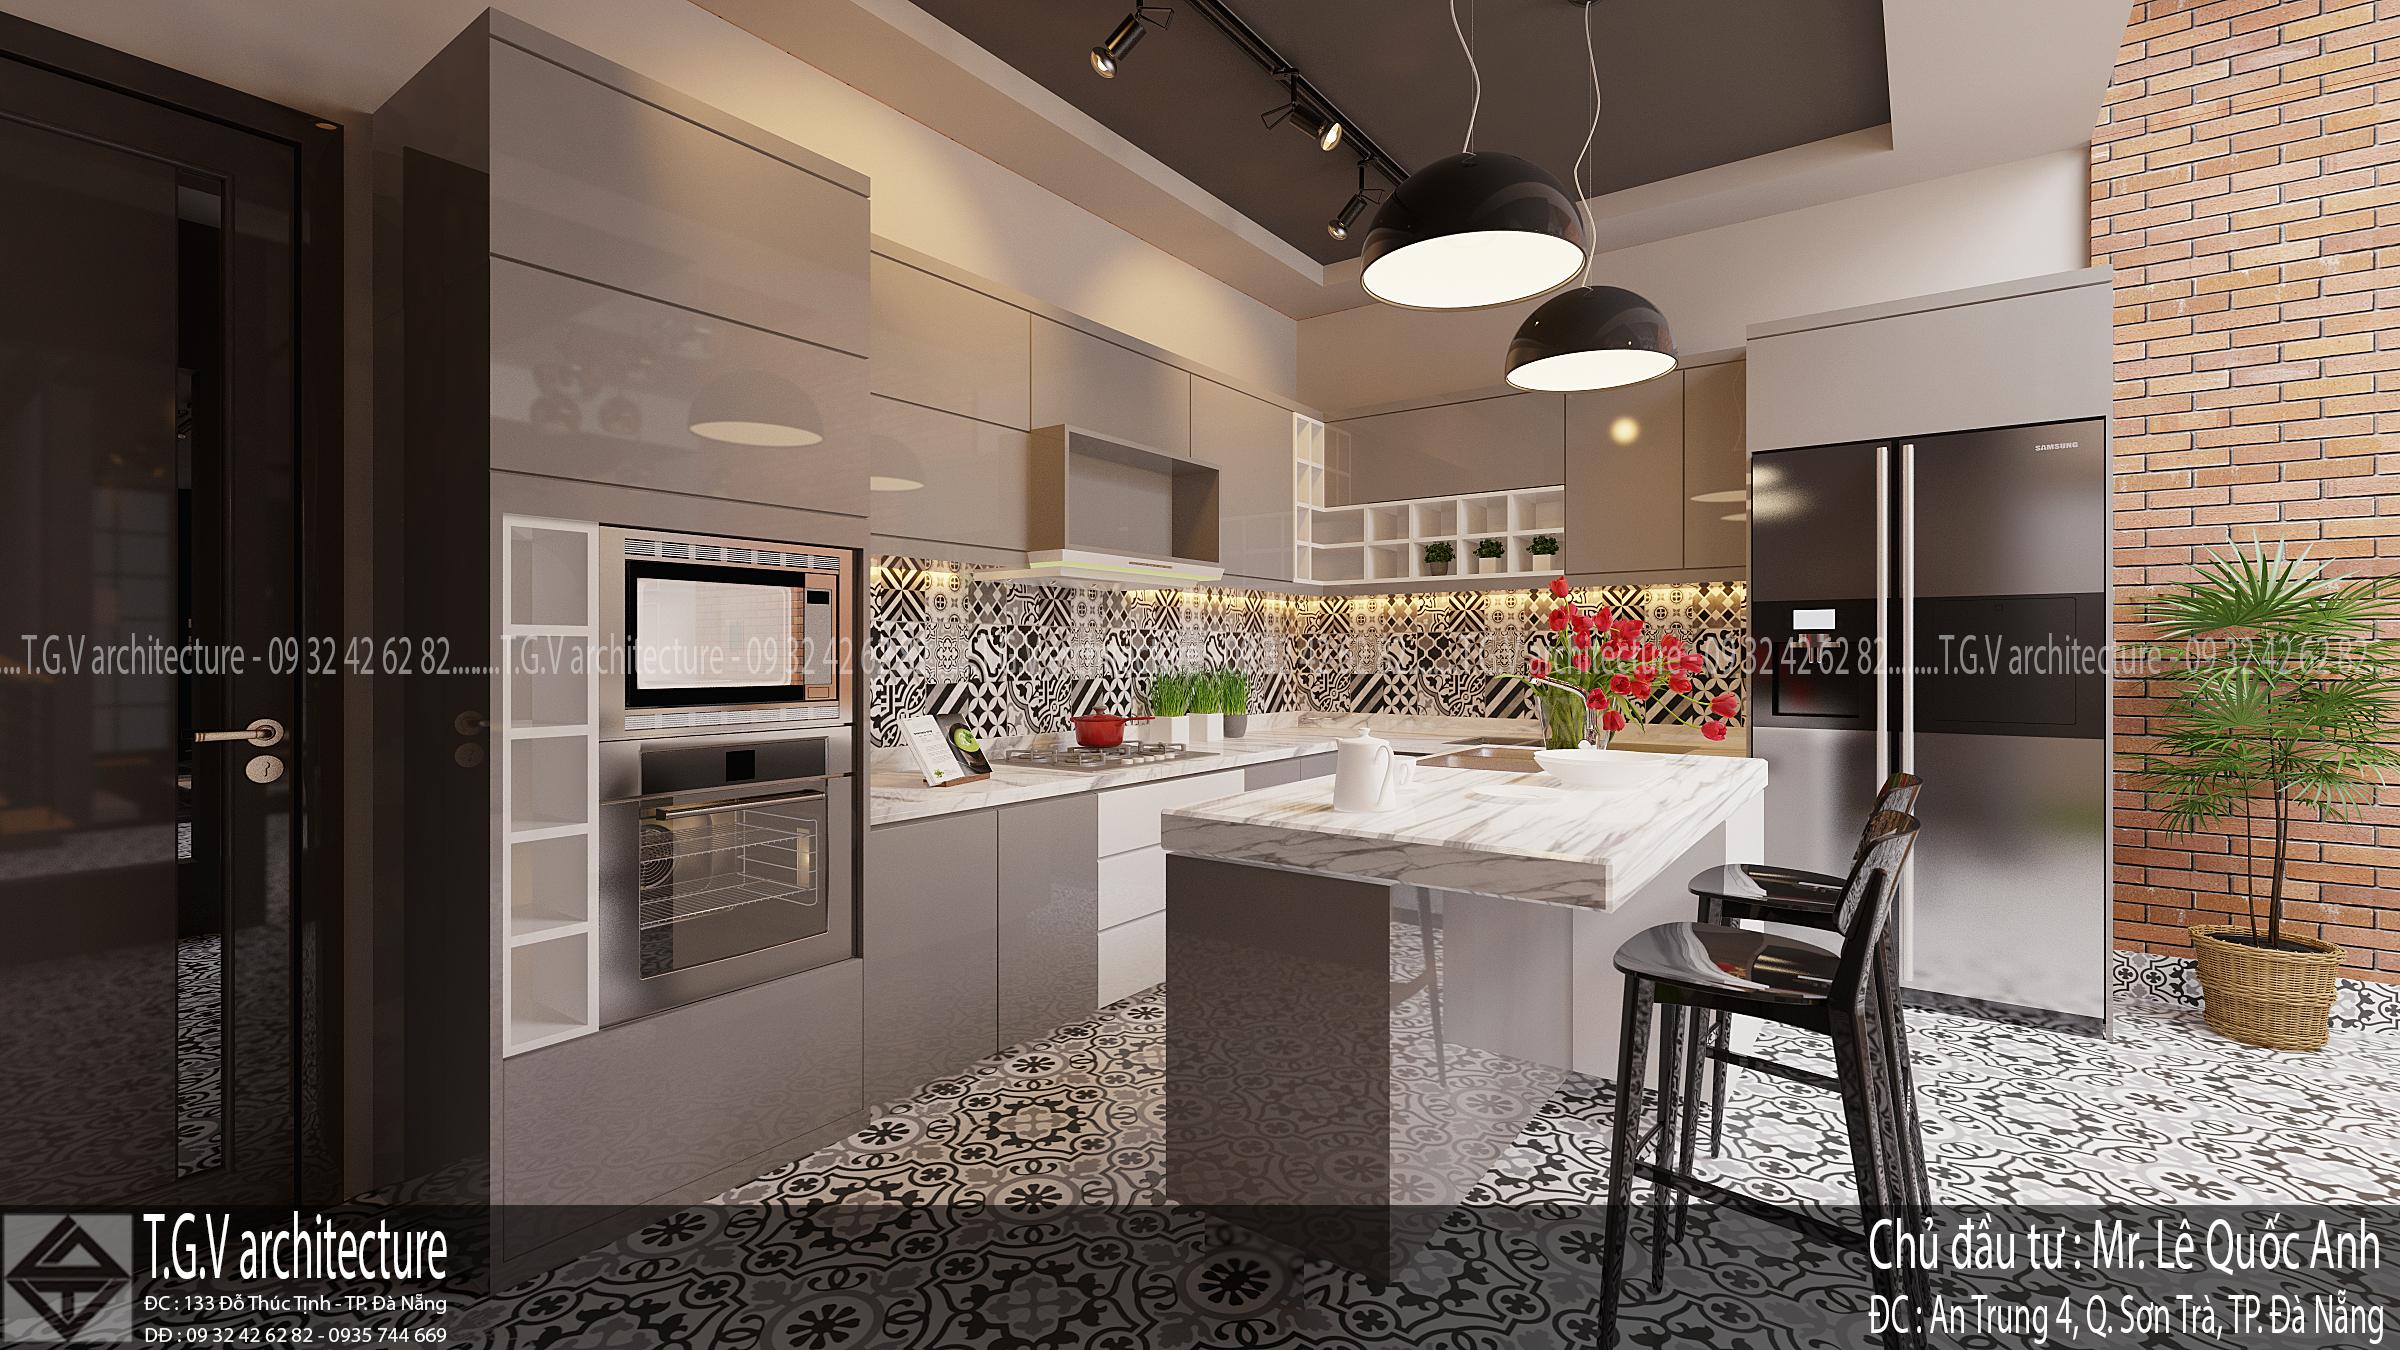 kitchenroom-WinHouse-view01